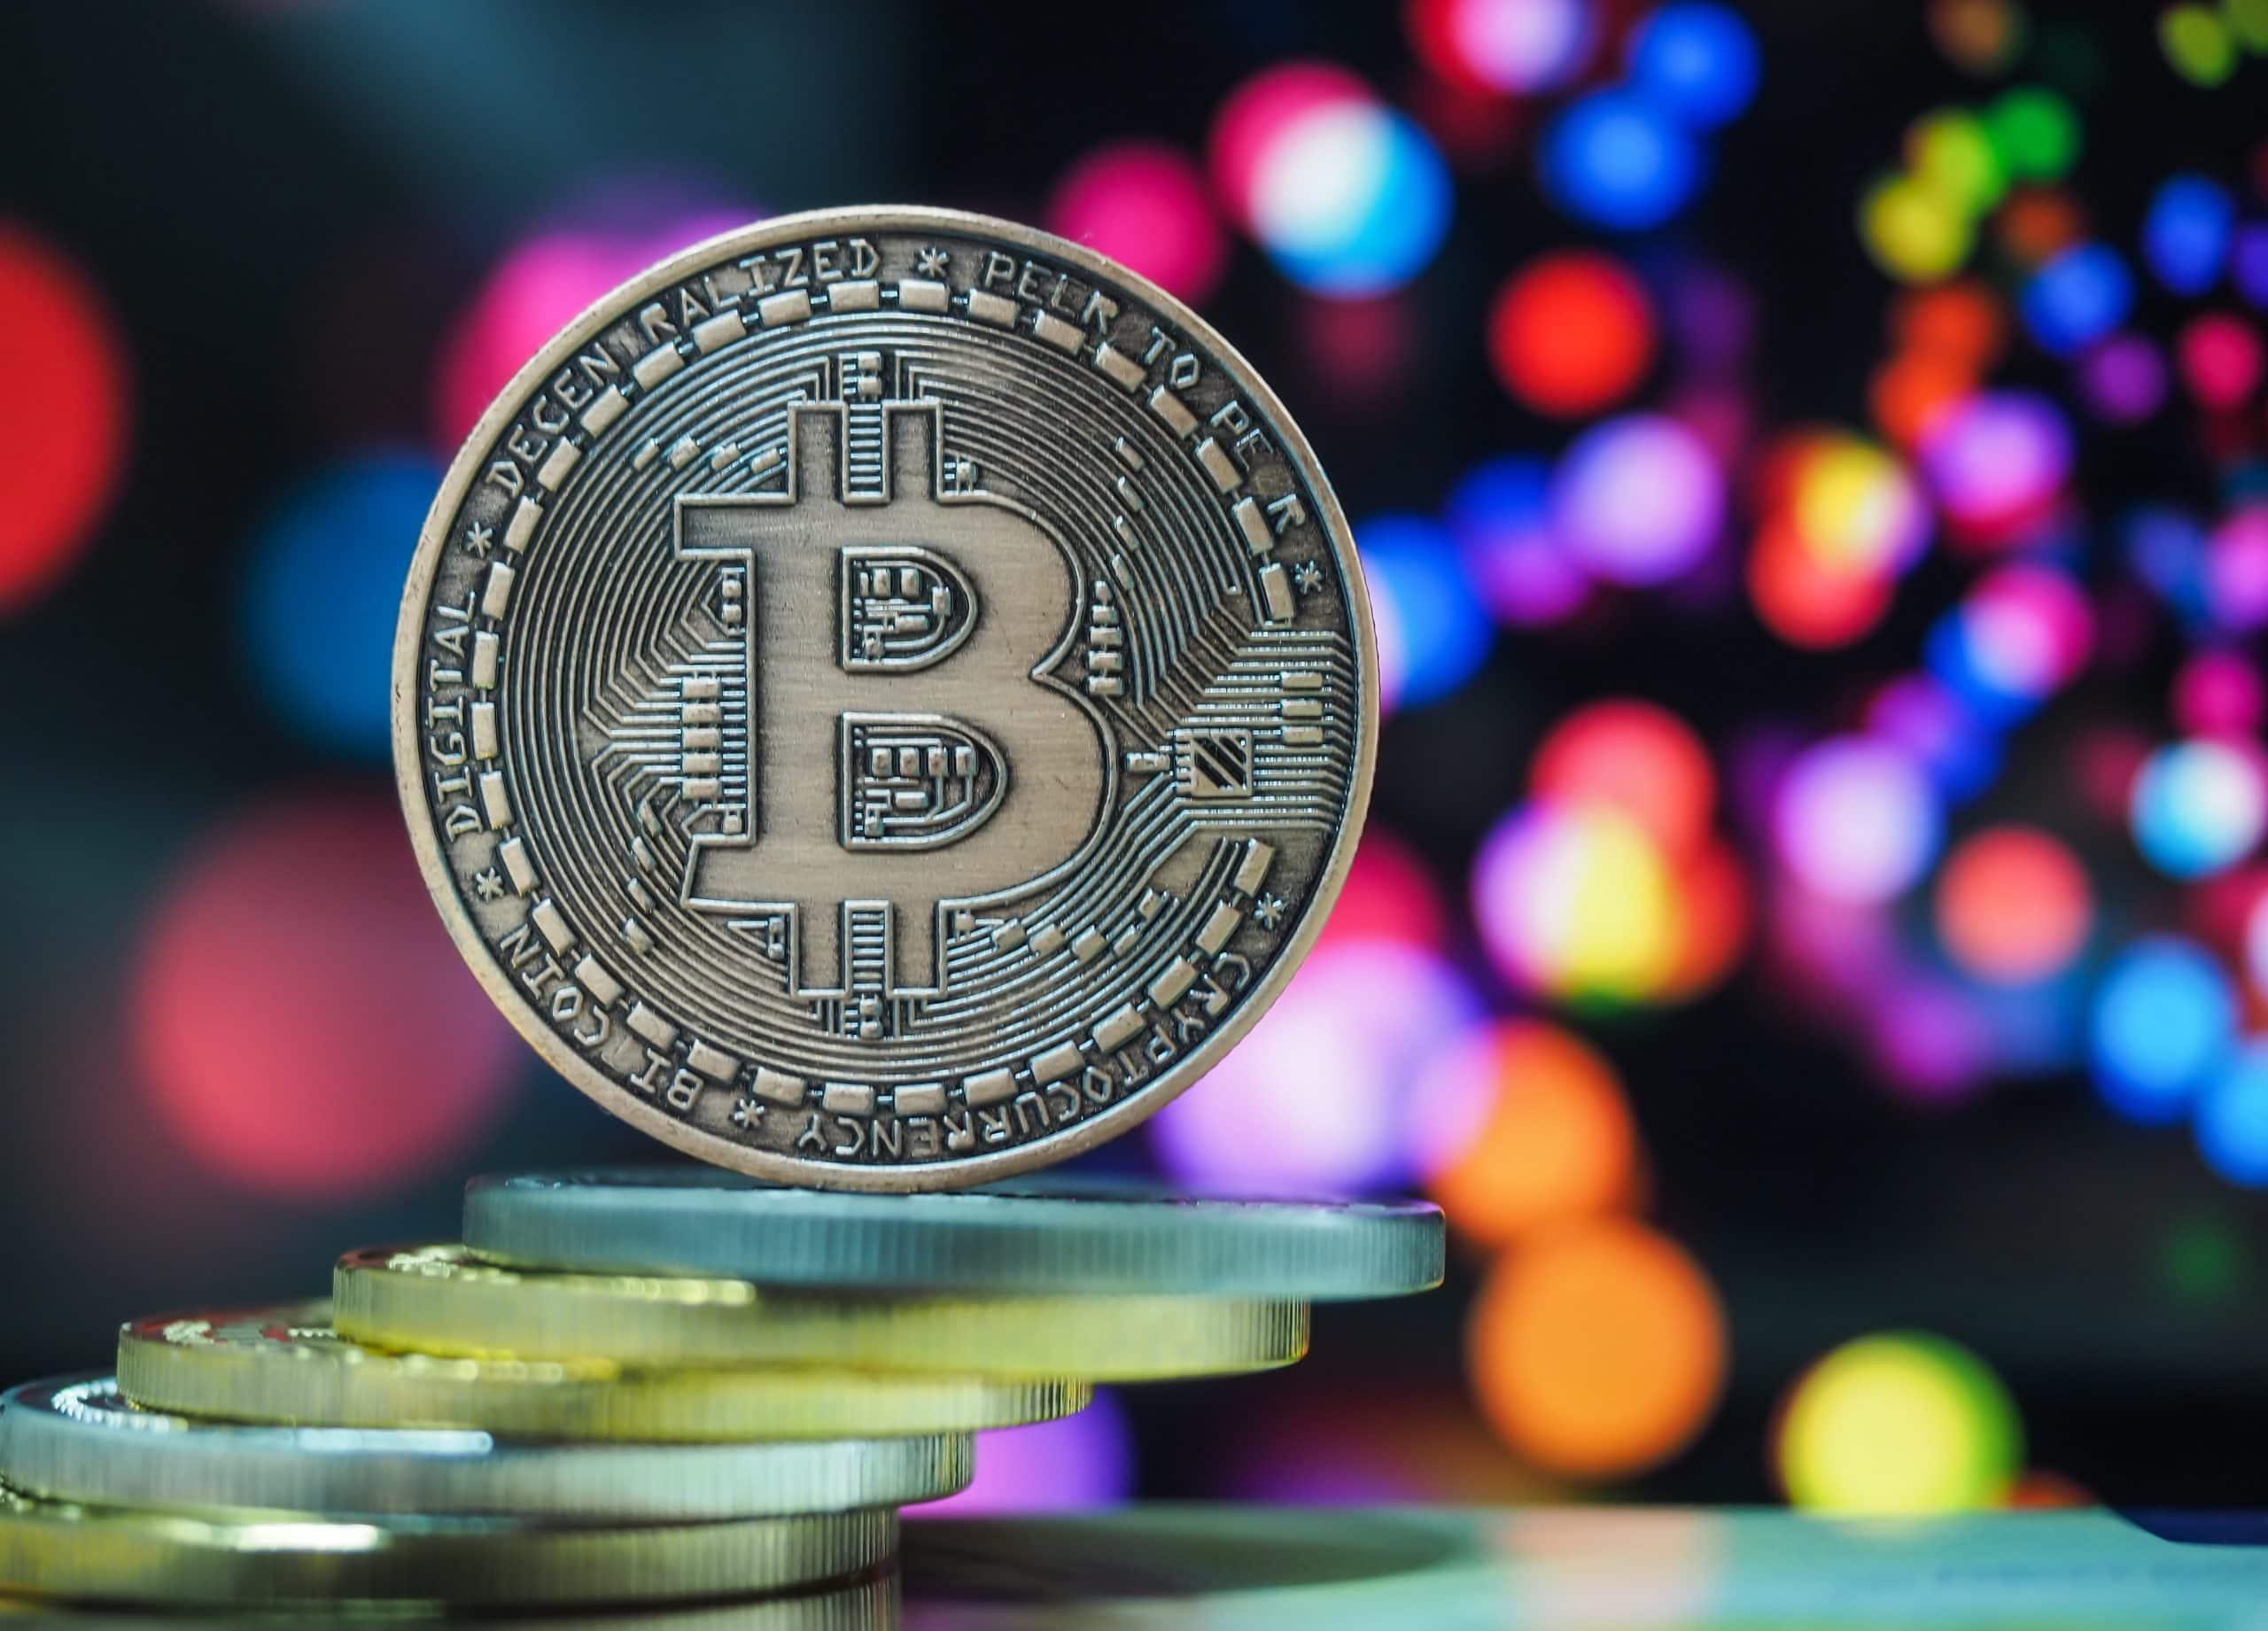 Showdown Bitcoin Kurs vor Richtungsentscheidung   Kryptokoll